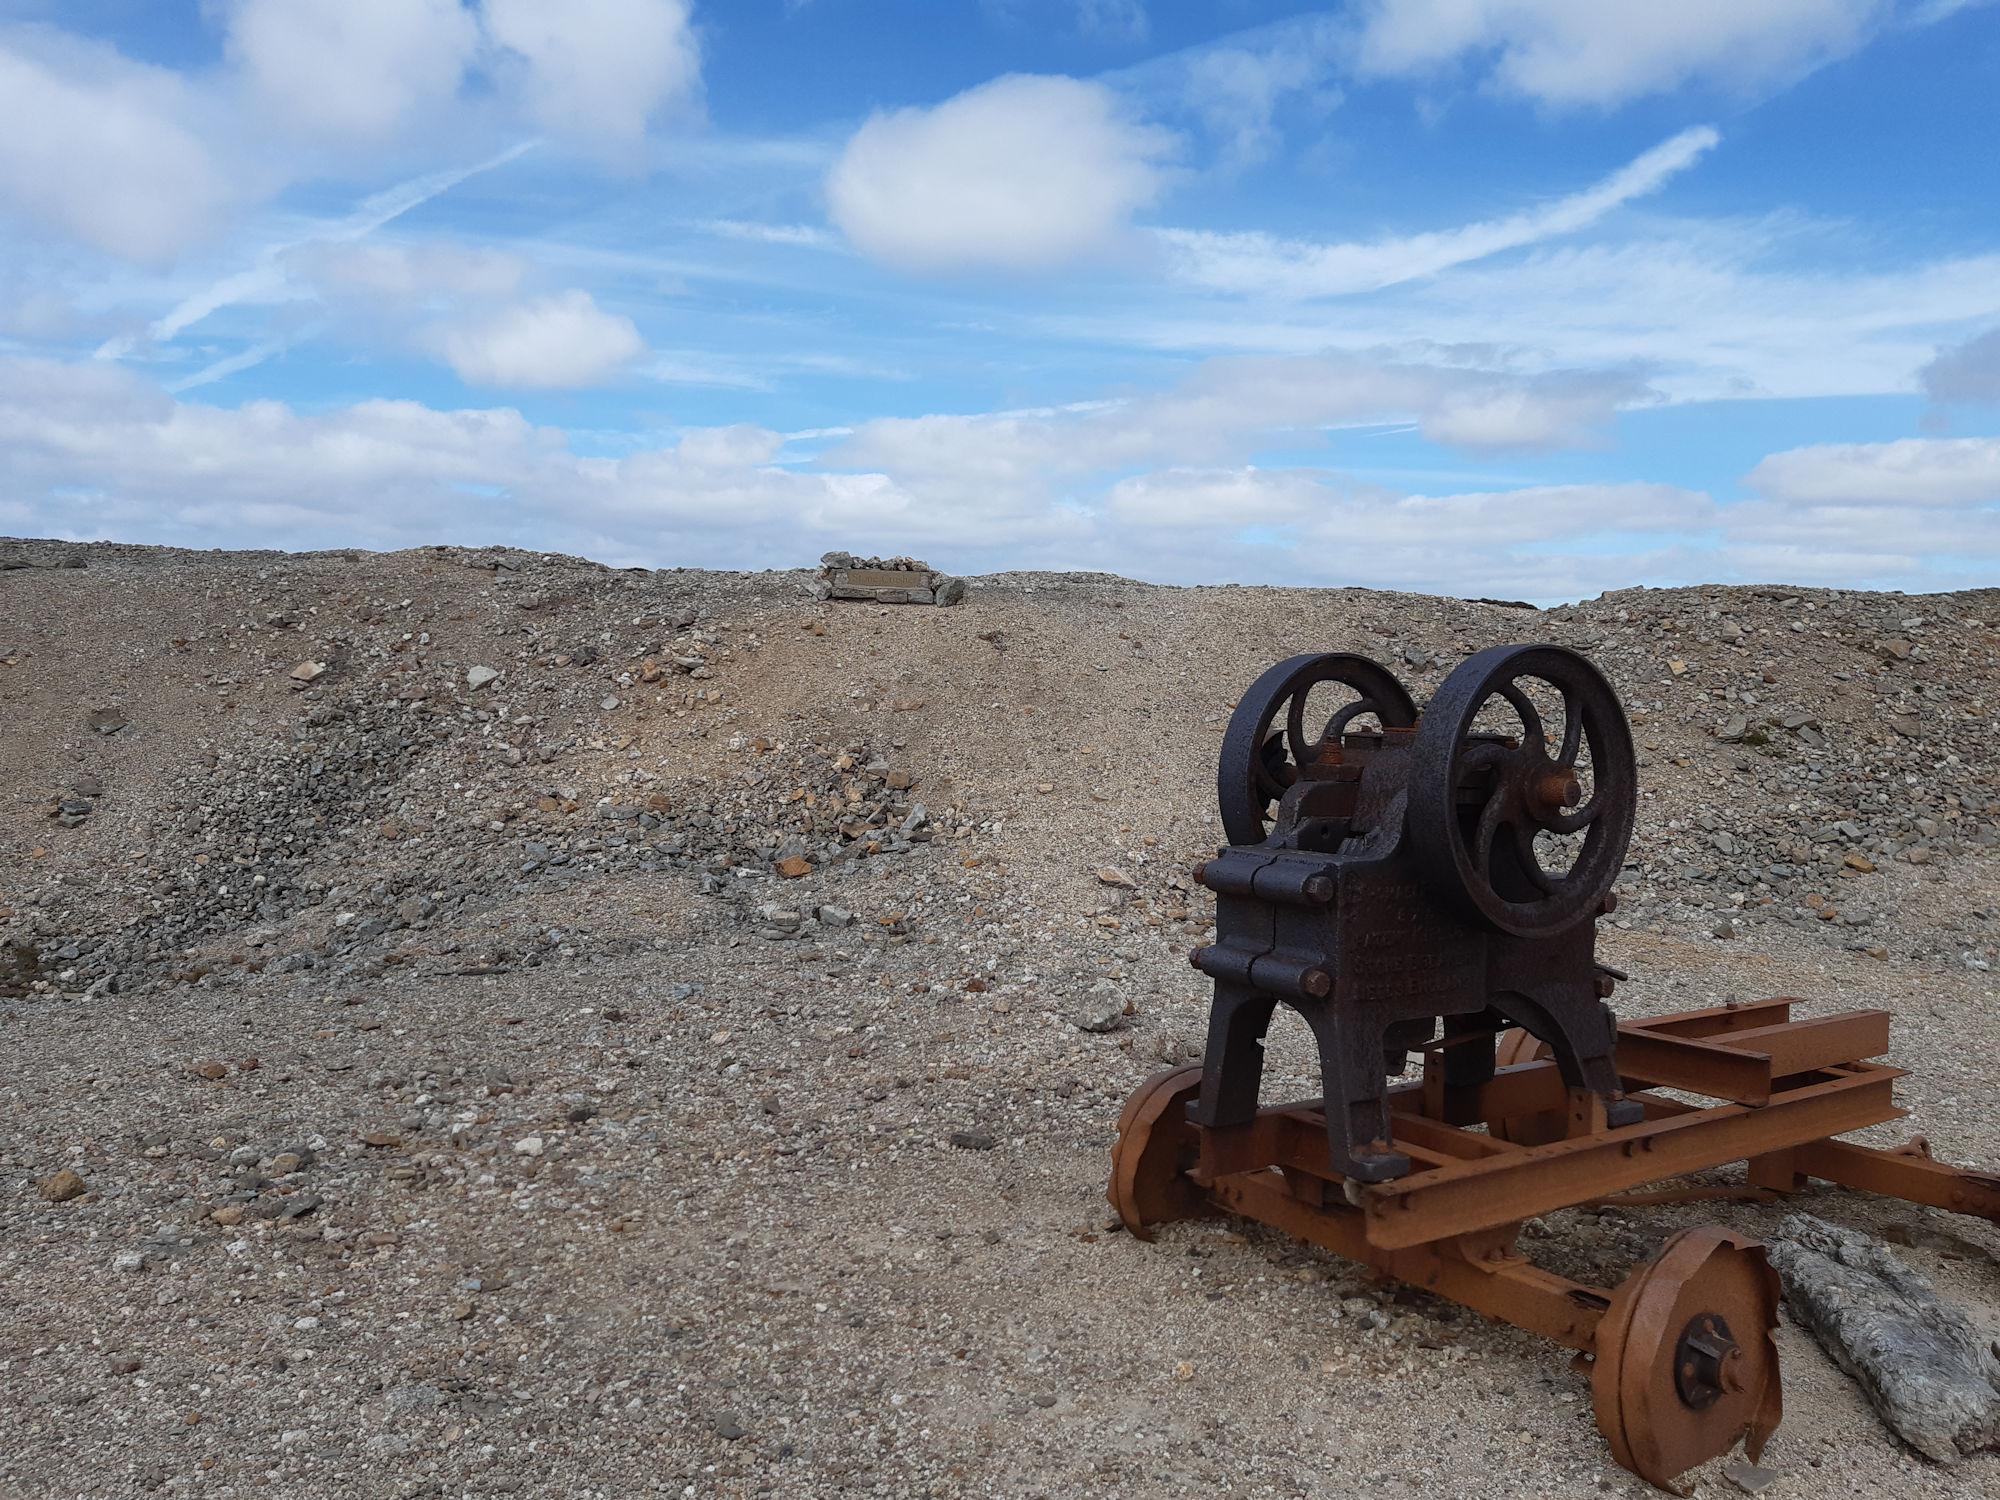 A stone crusher